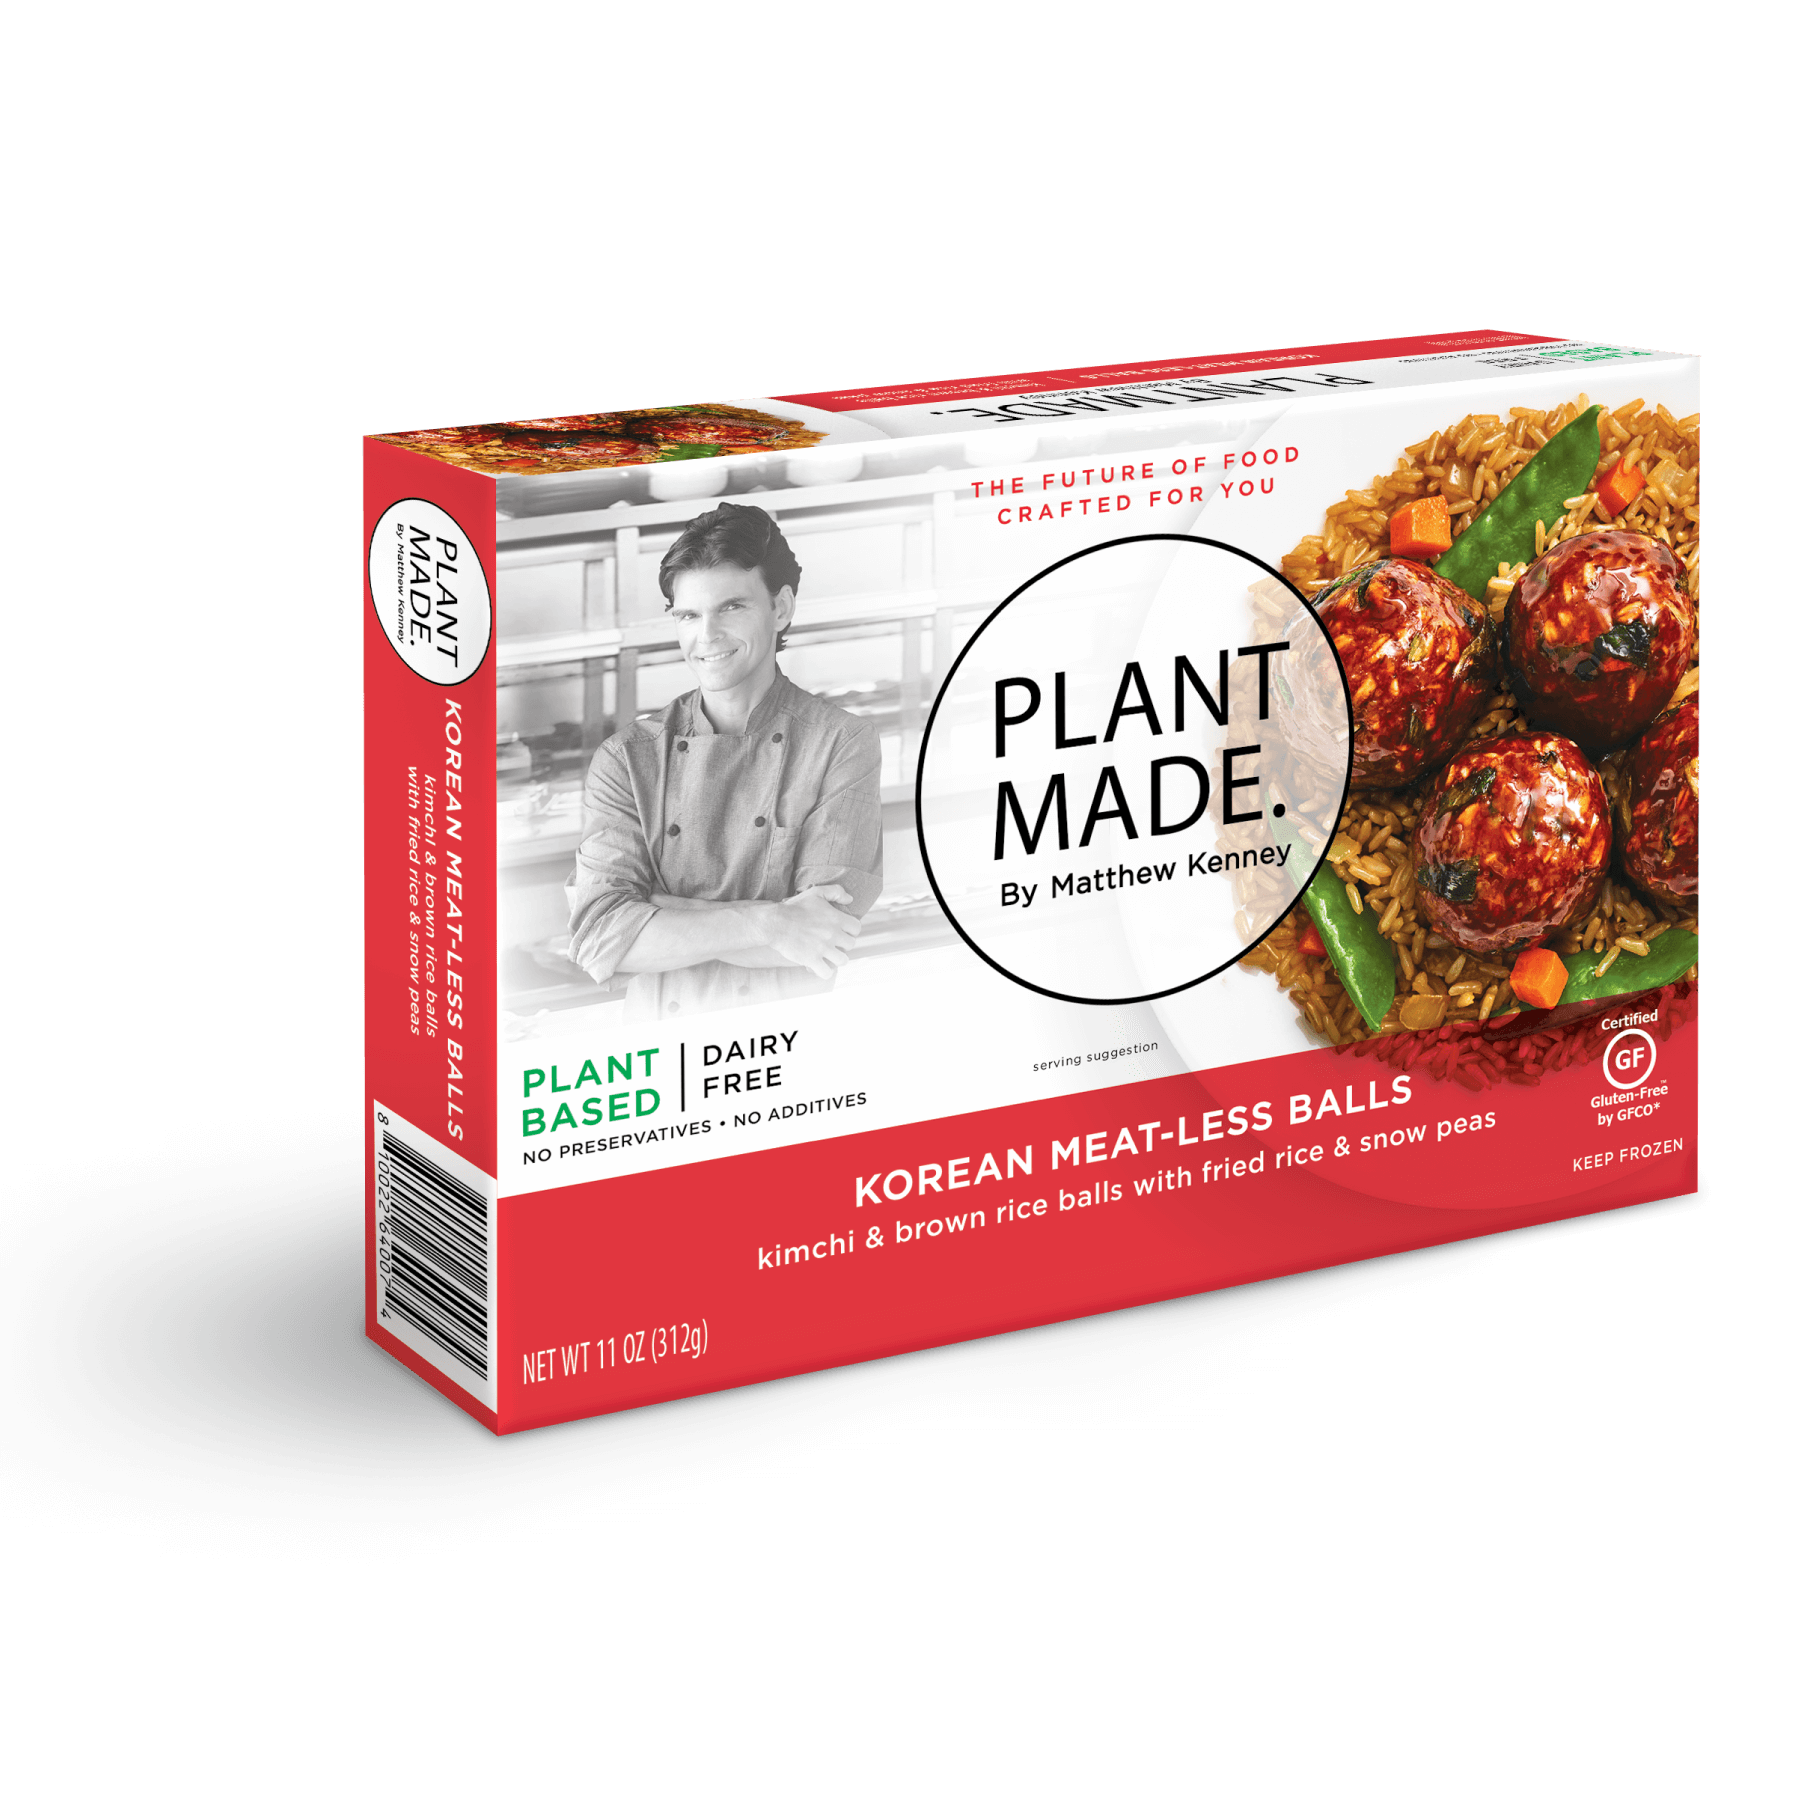 PlantMade Korean Meatballs